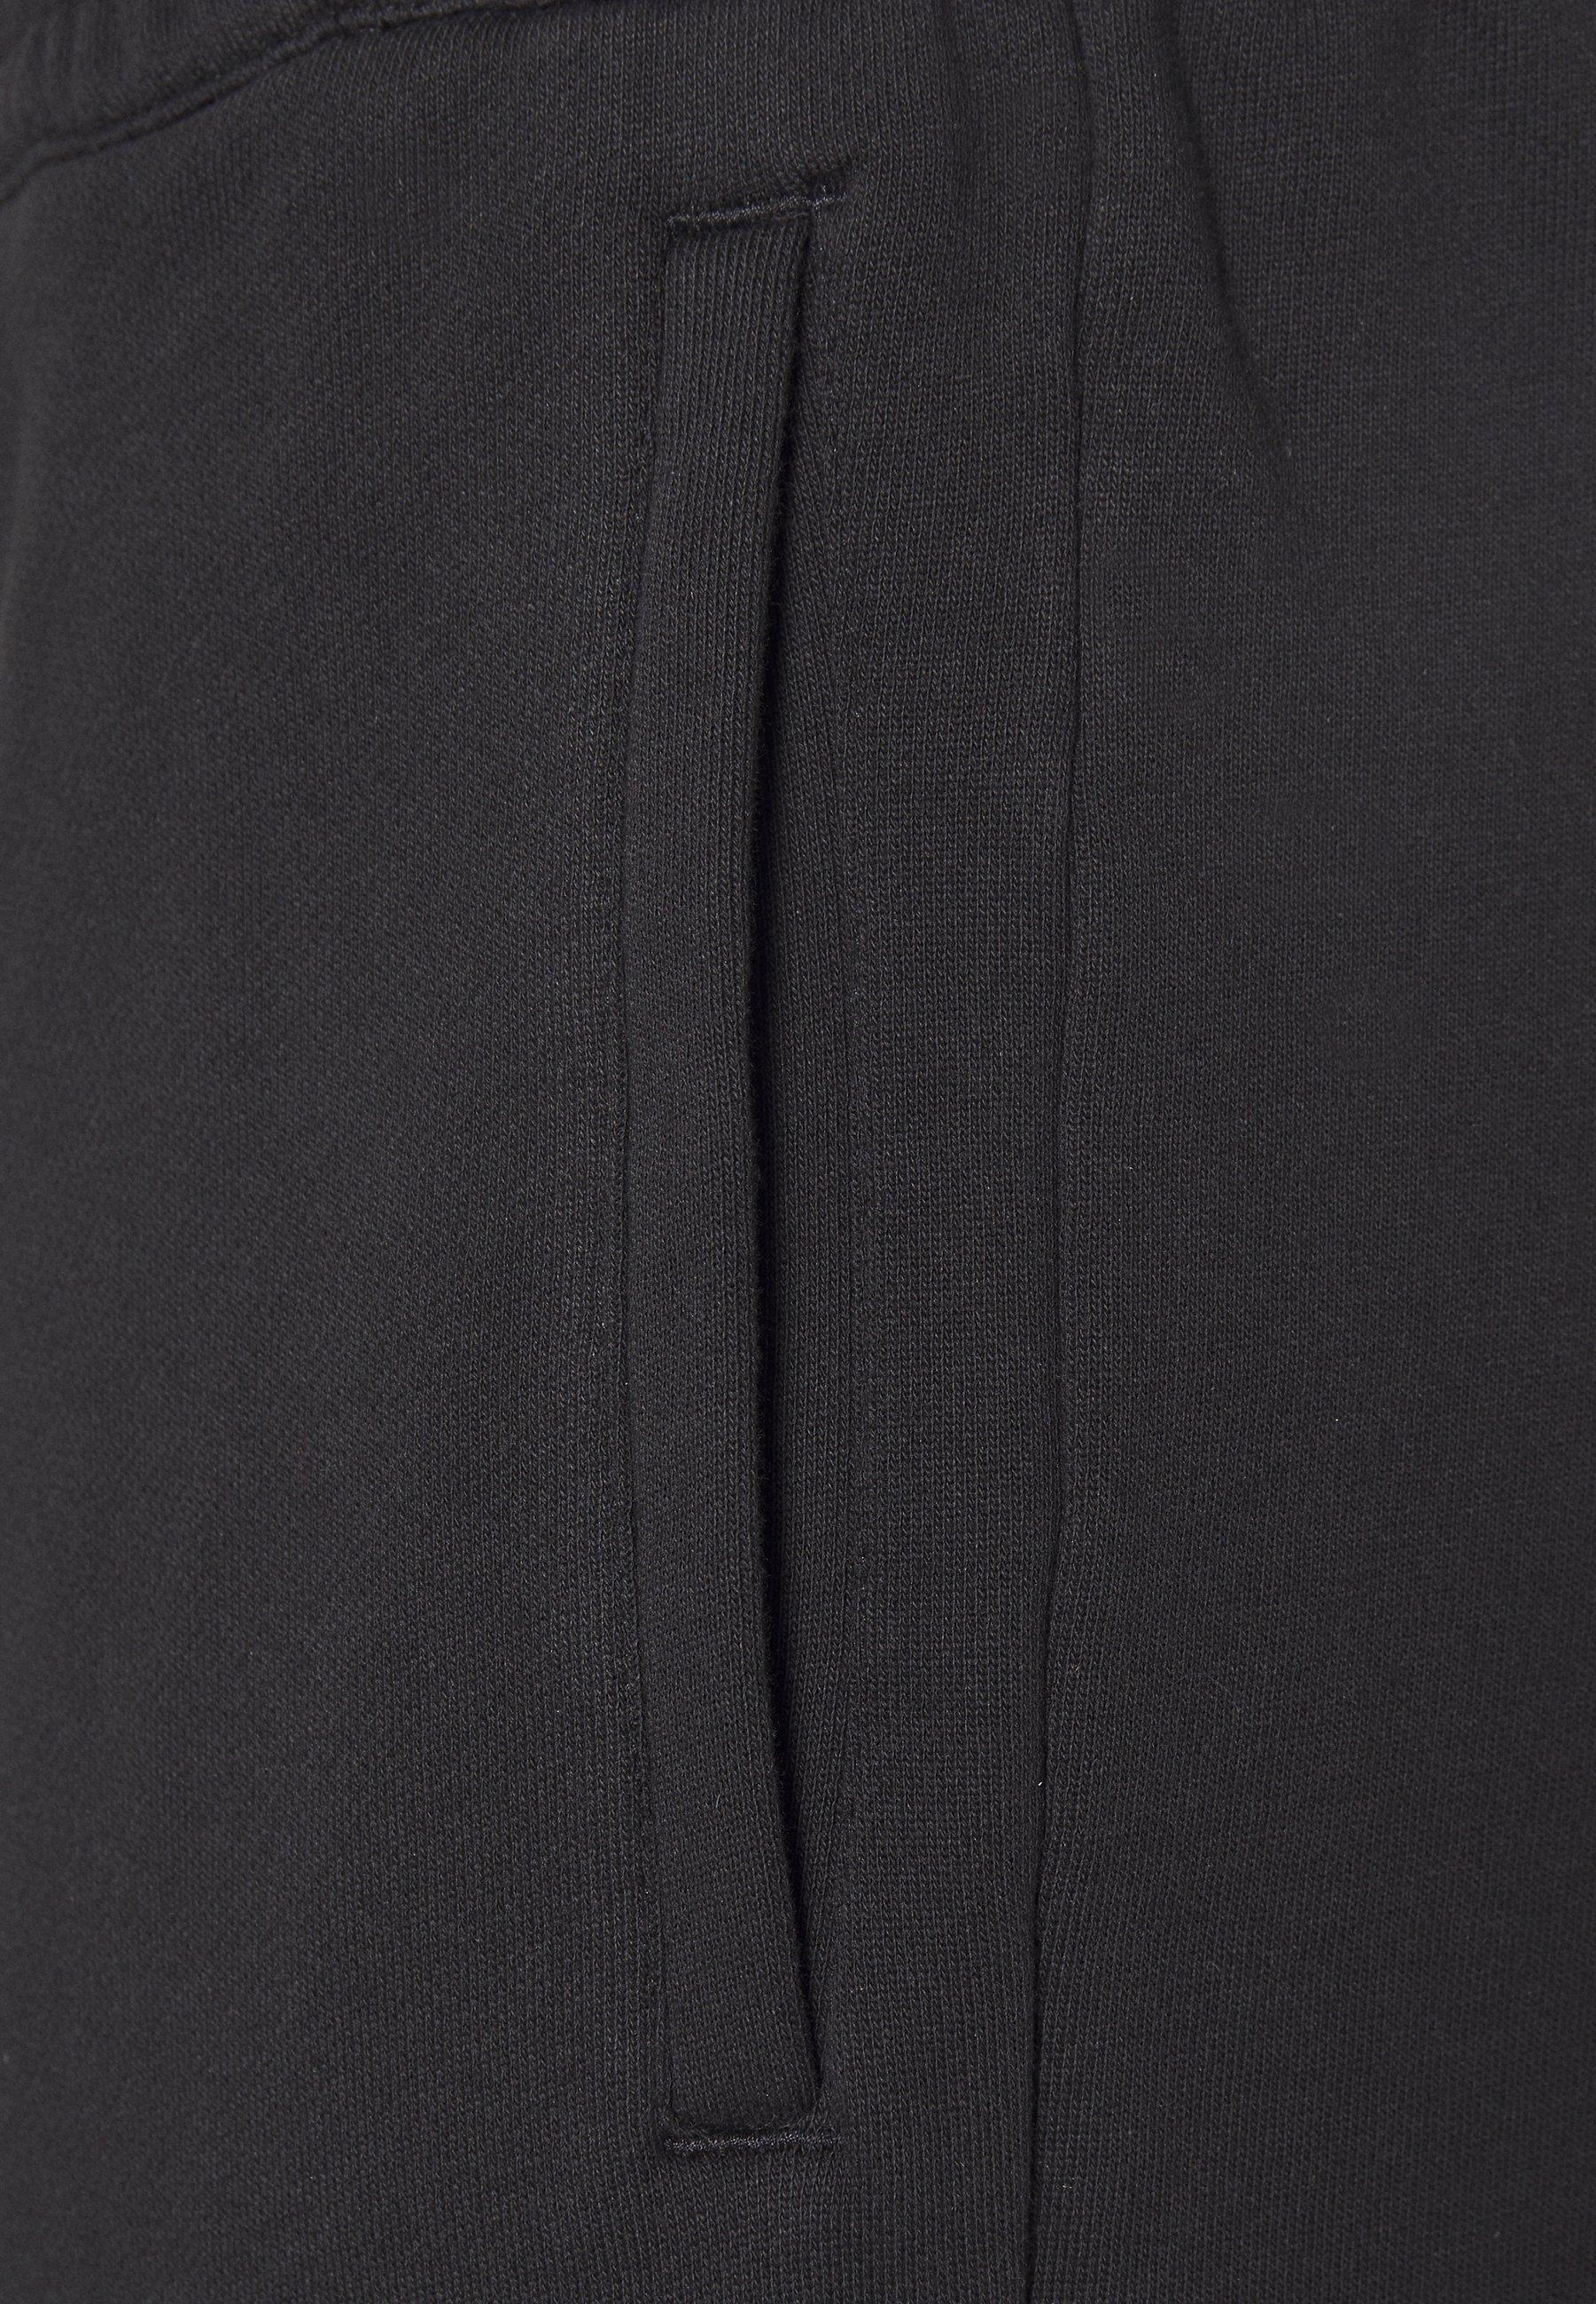 Adidas Originals Spodnie Treningowe - Black/white